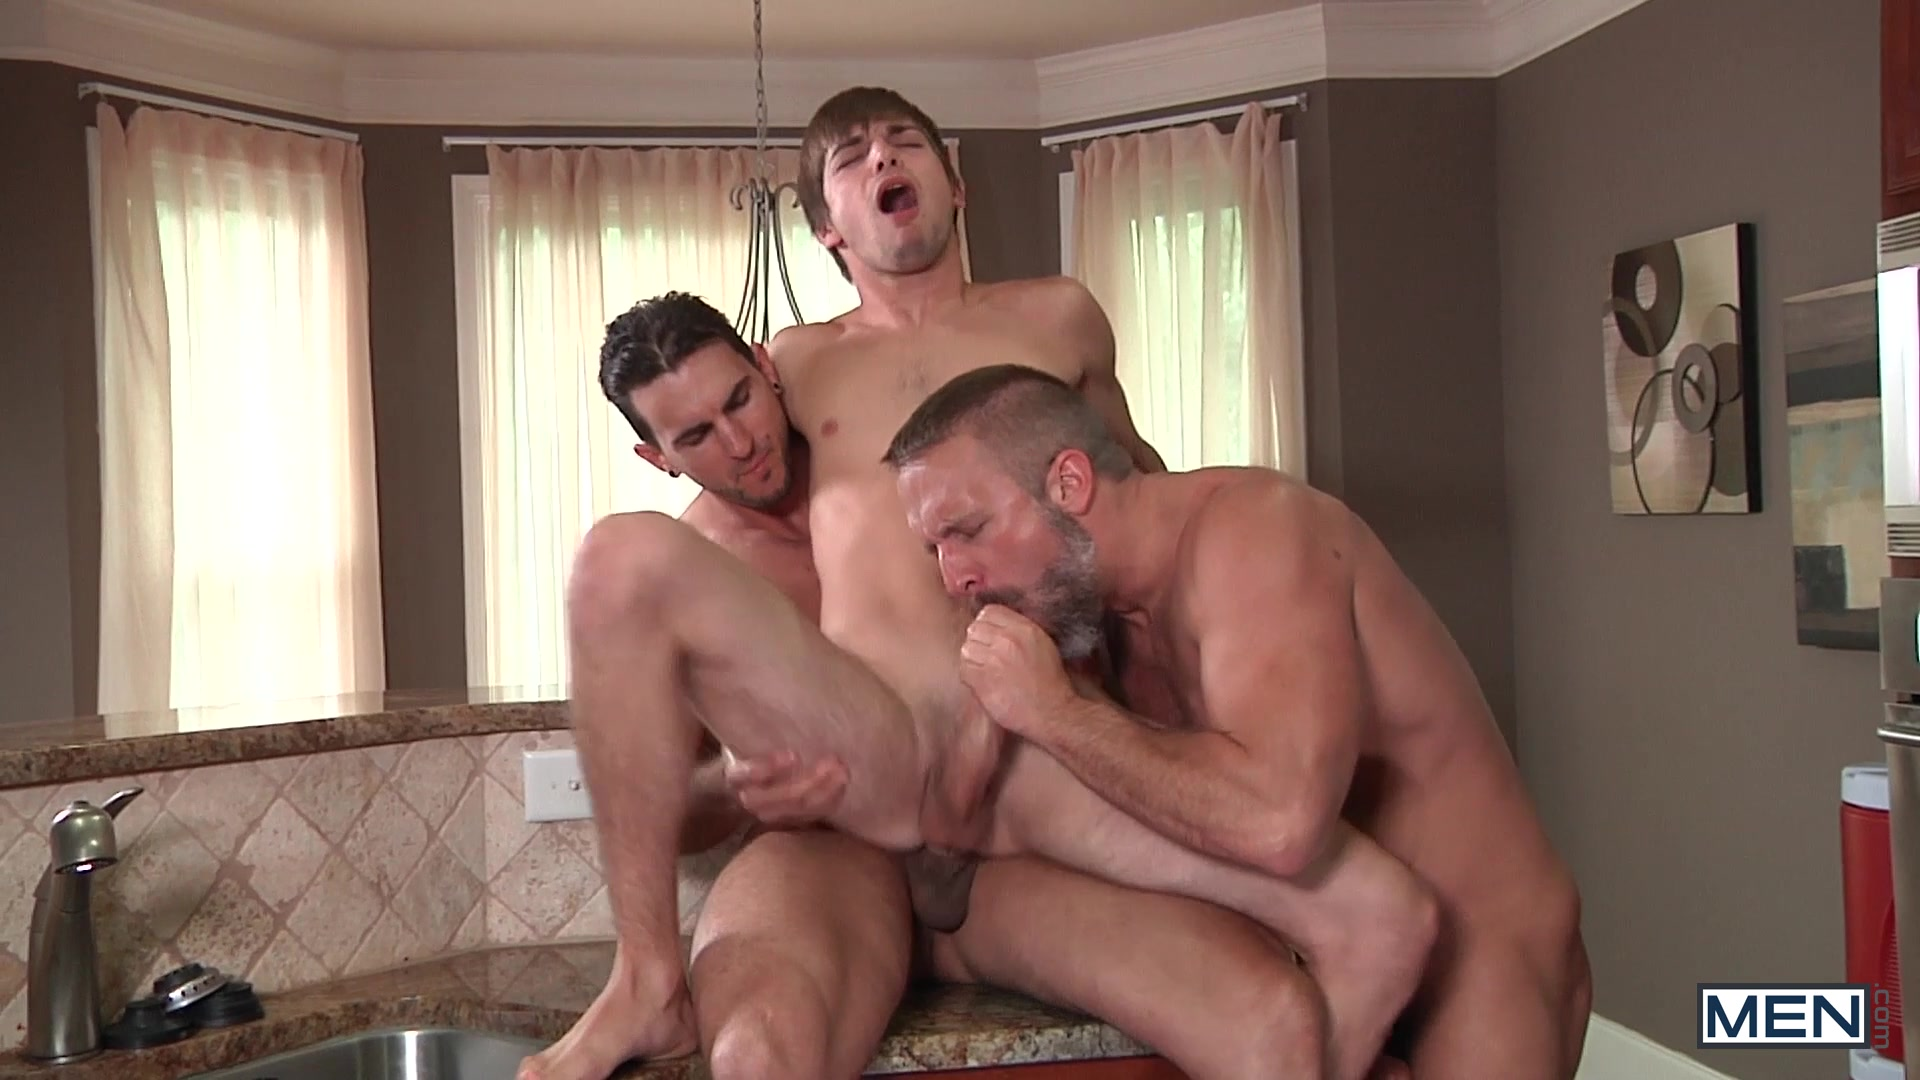 Watch Stepfather's Secret Part 7 – Dirk Caber – Phenix Saint – Johnny Rapid – Dmh – Drill My Hole (MEN.COM) Gay Porn Tube Videos Gifs And Free XXX HD Sex Movies Photos Online